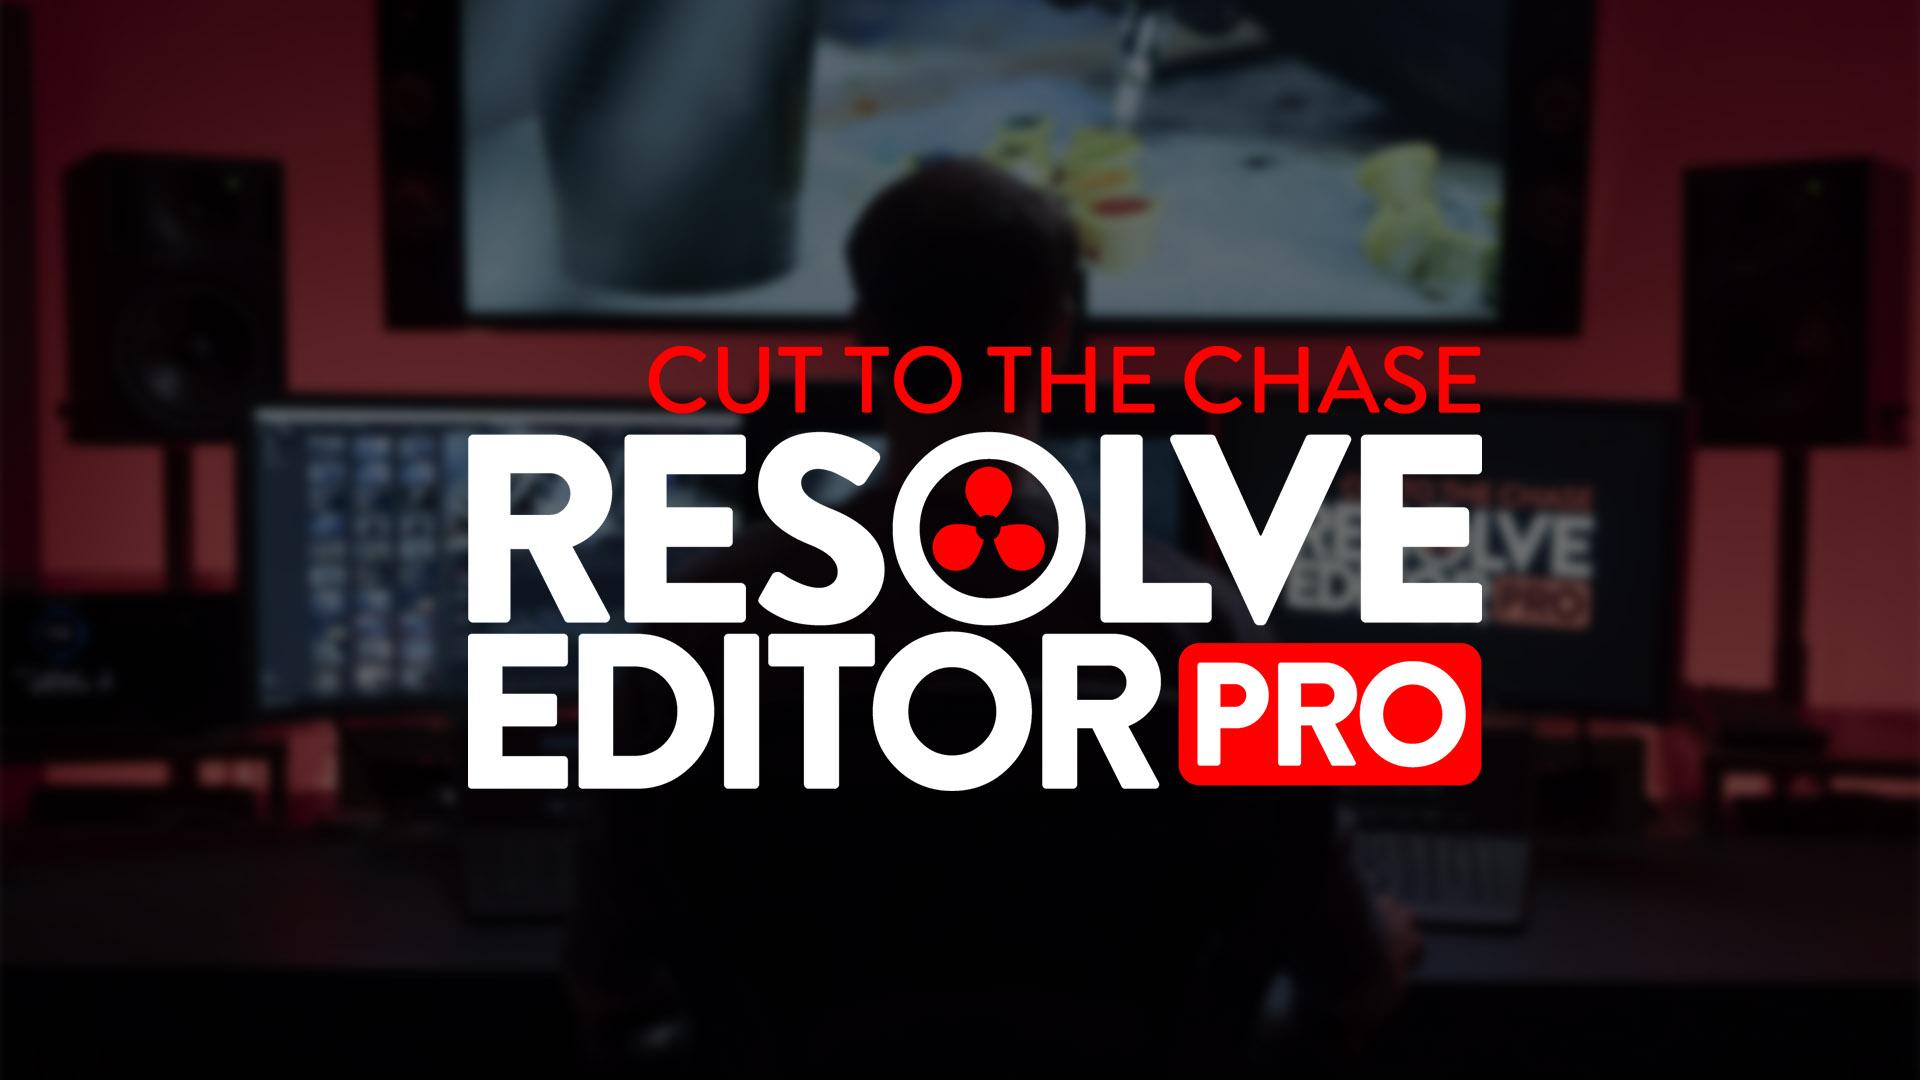 Curso en línea de Resolve Editor Pro: cámbiate fácilmente a DaVinci Resolve para editar